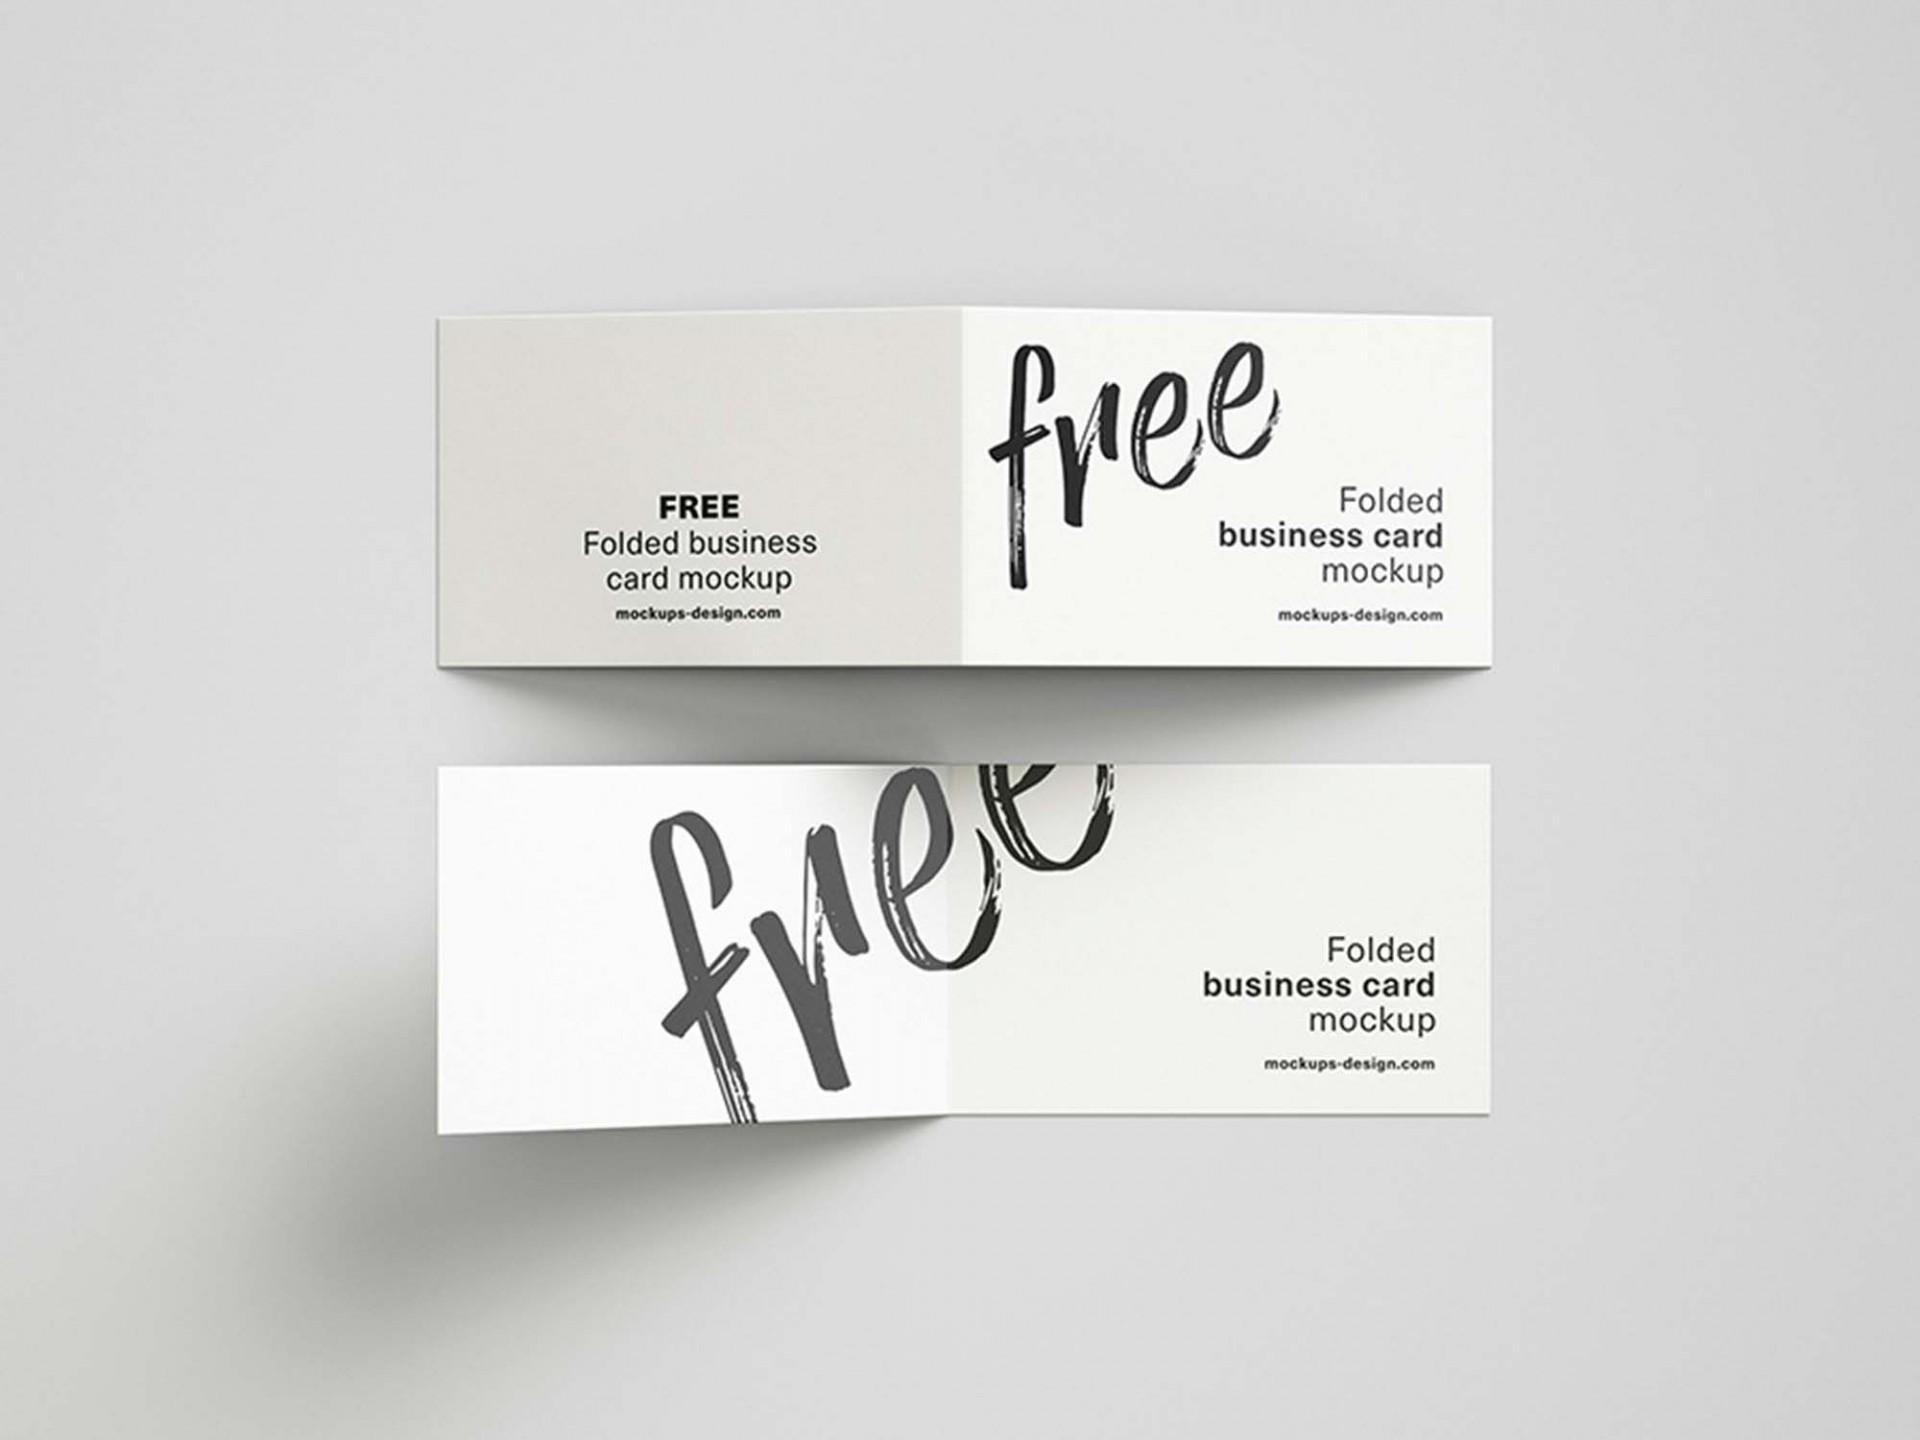 006 Astounding Folding Busines Card Template Highest Quality  Folded Photoshop Ai Free1920